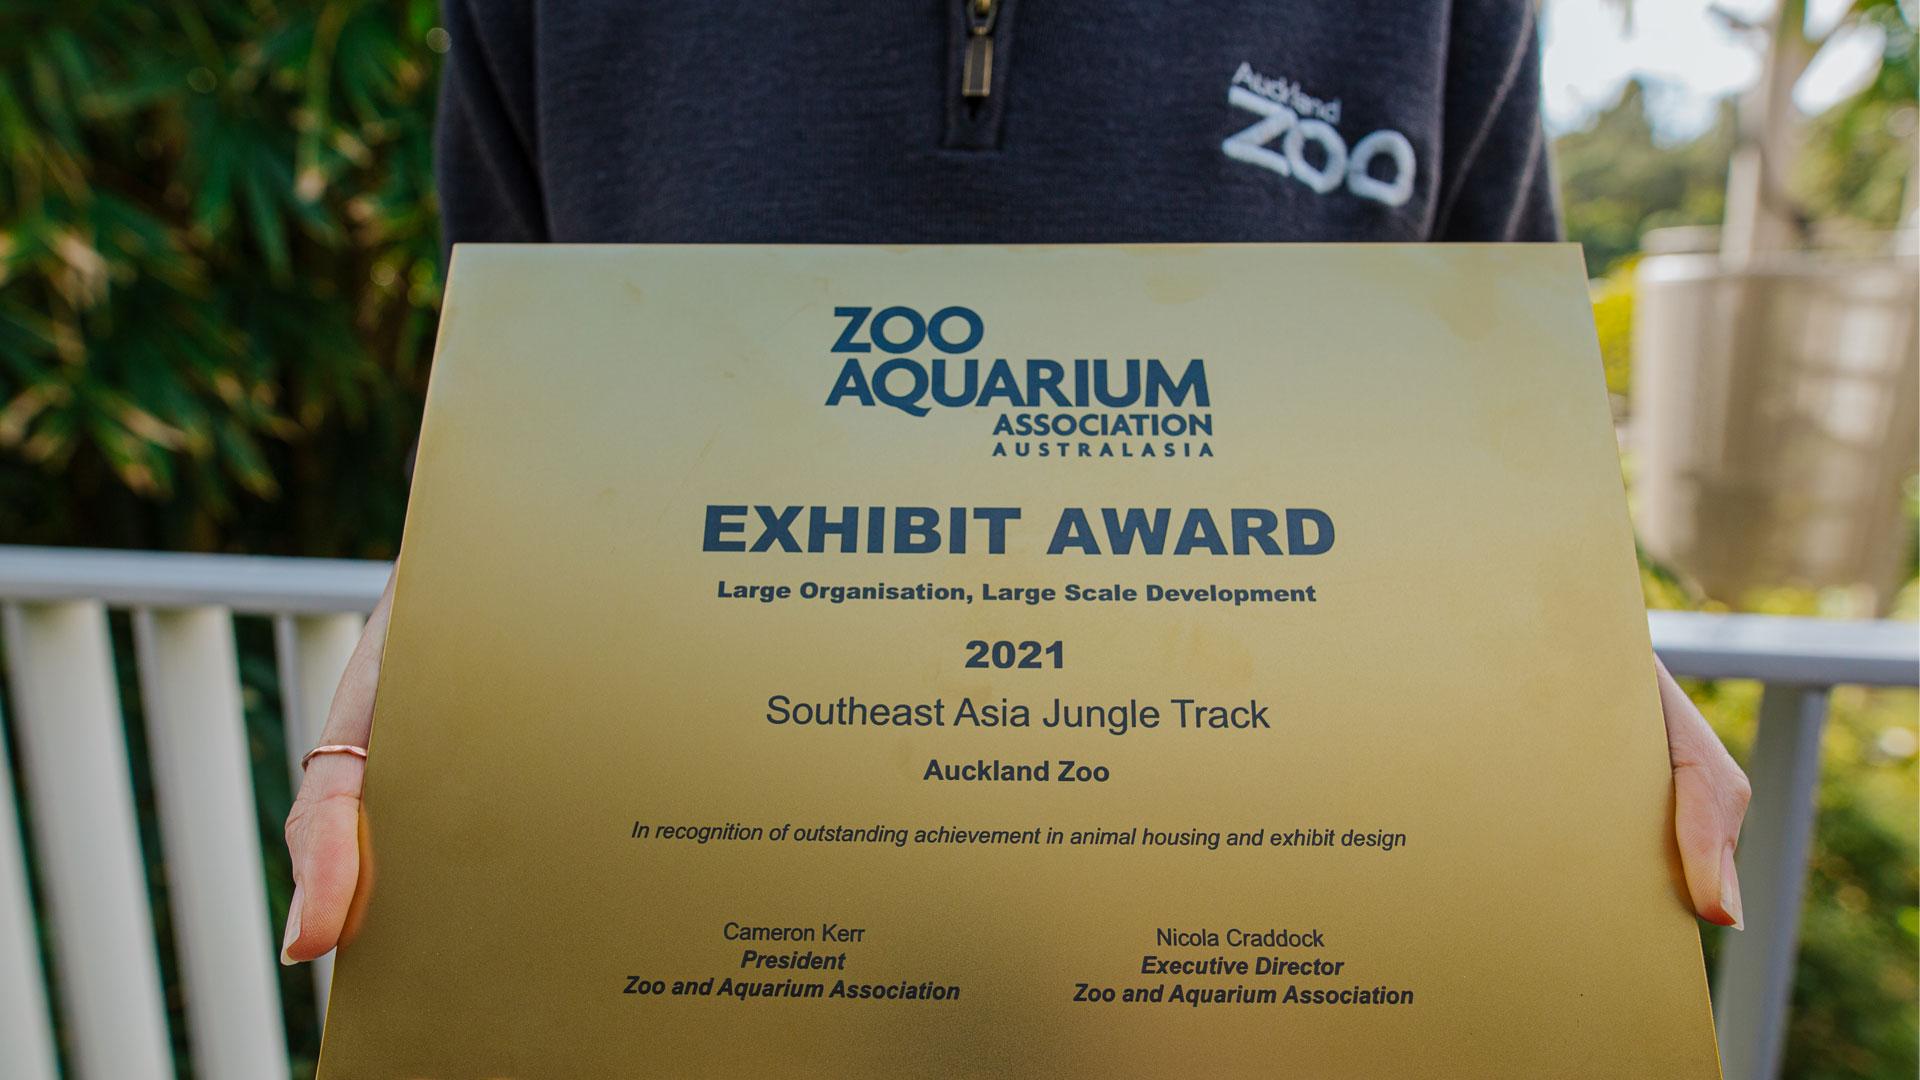 https://rfacdn.nz/zoo/assets/media/zaa-award-high-canopy-gallery-4.jpg